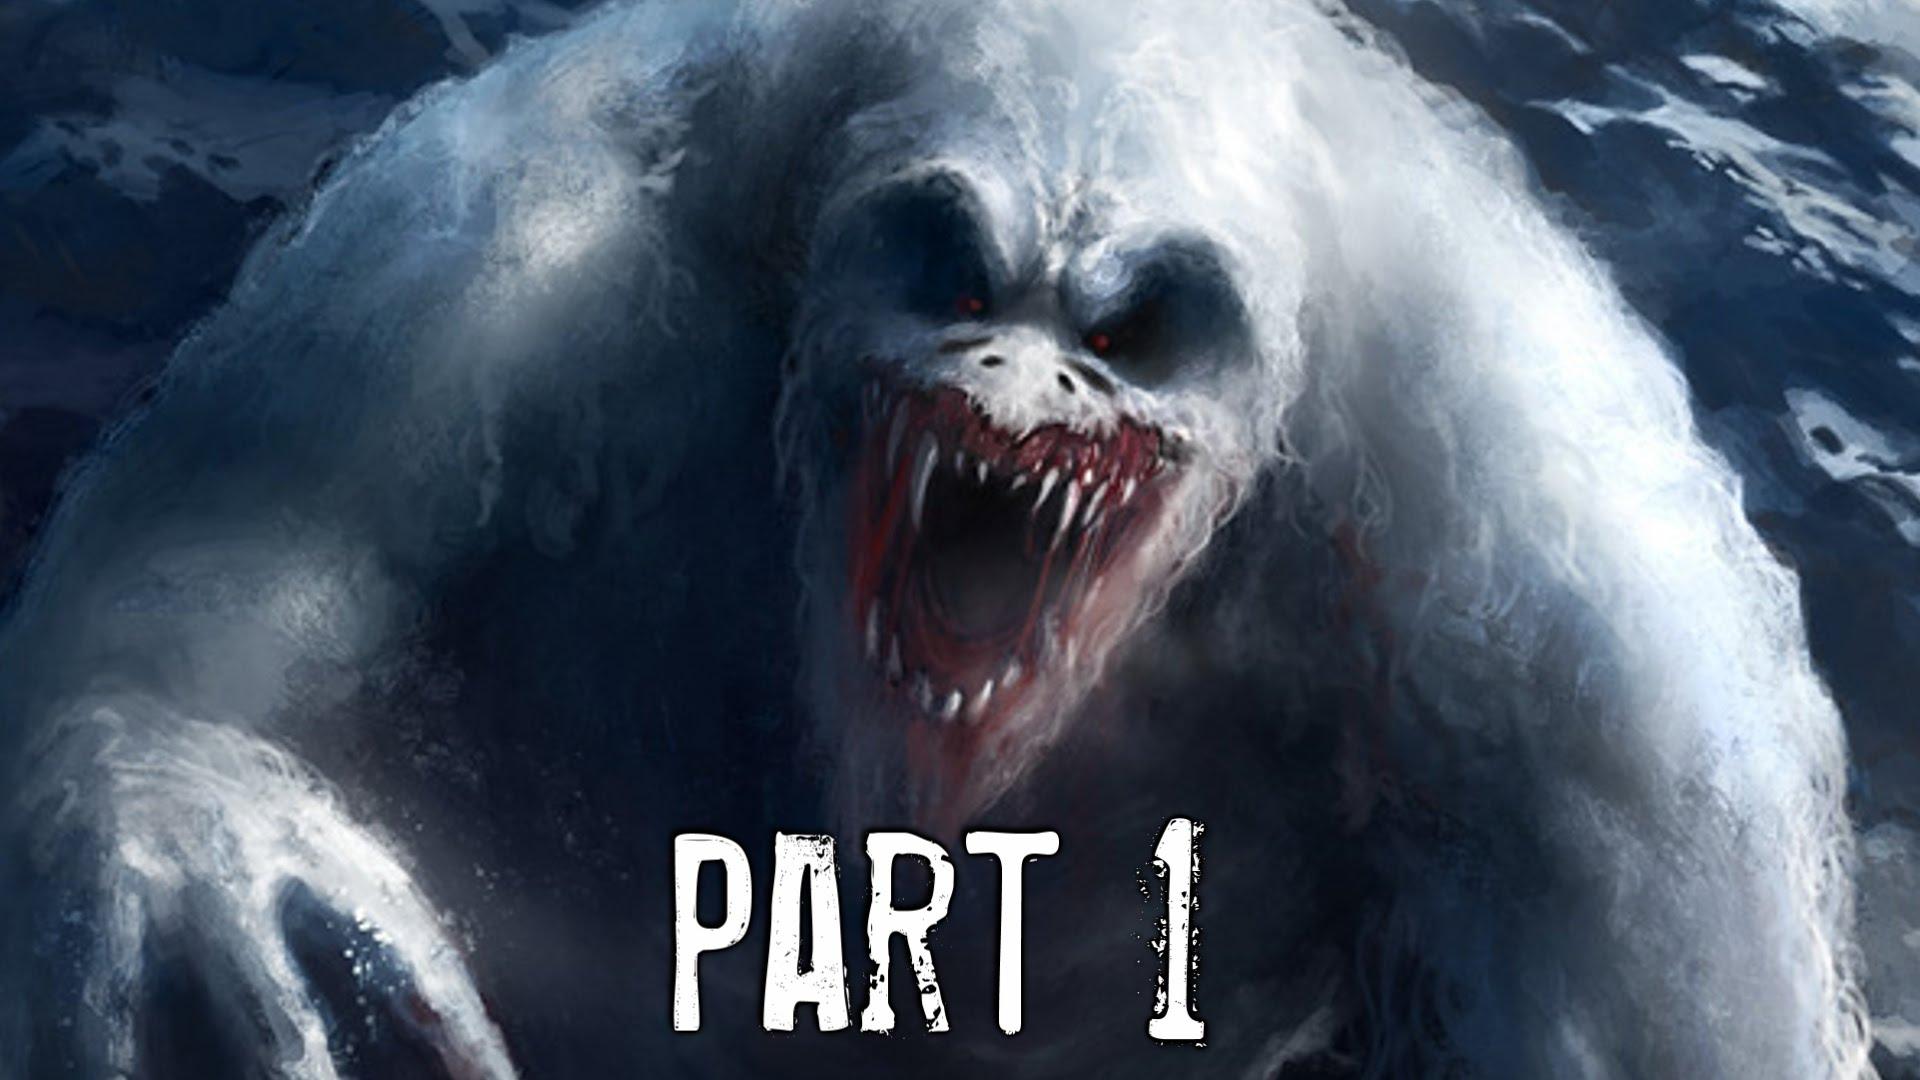 Far Cry 4 Valley Of The Yetis Walkthrough Gameplay Part 1 Pilot Ps4 Video Games Wikis Cheats Walkthroughs Reviews News Videos